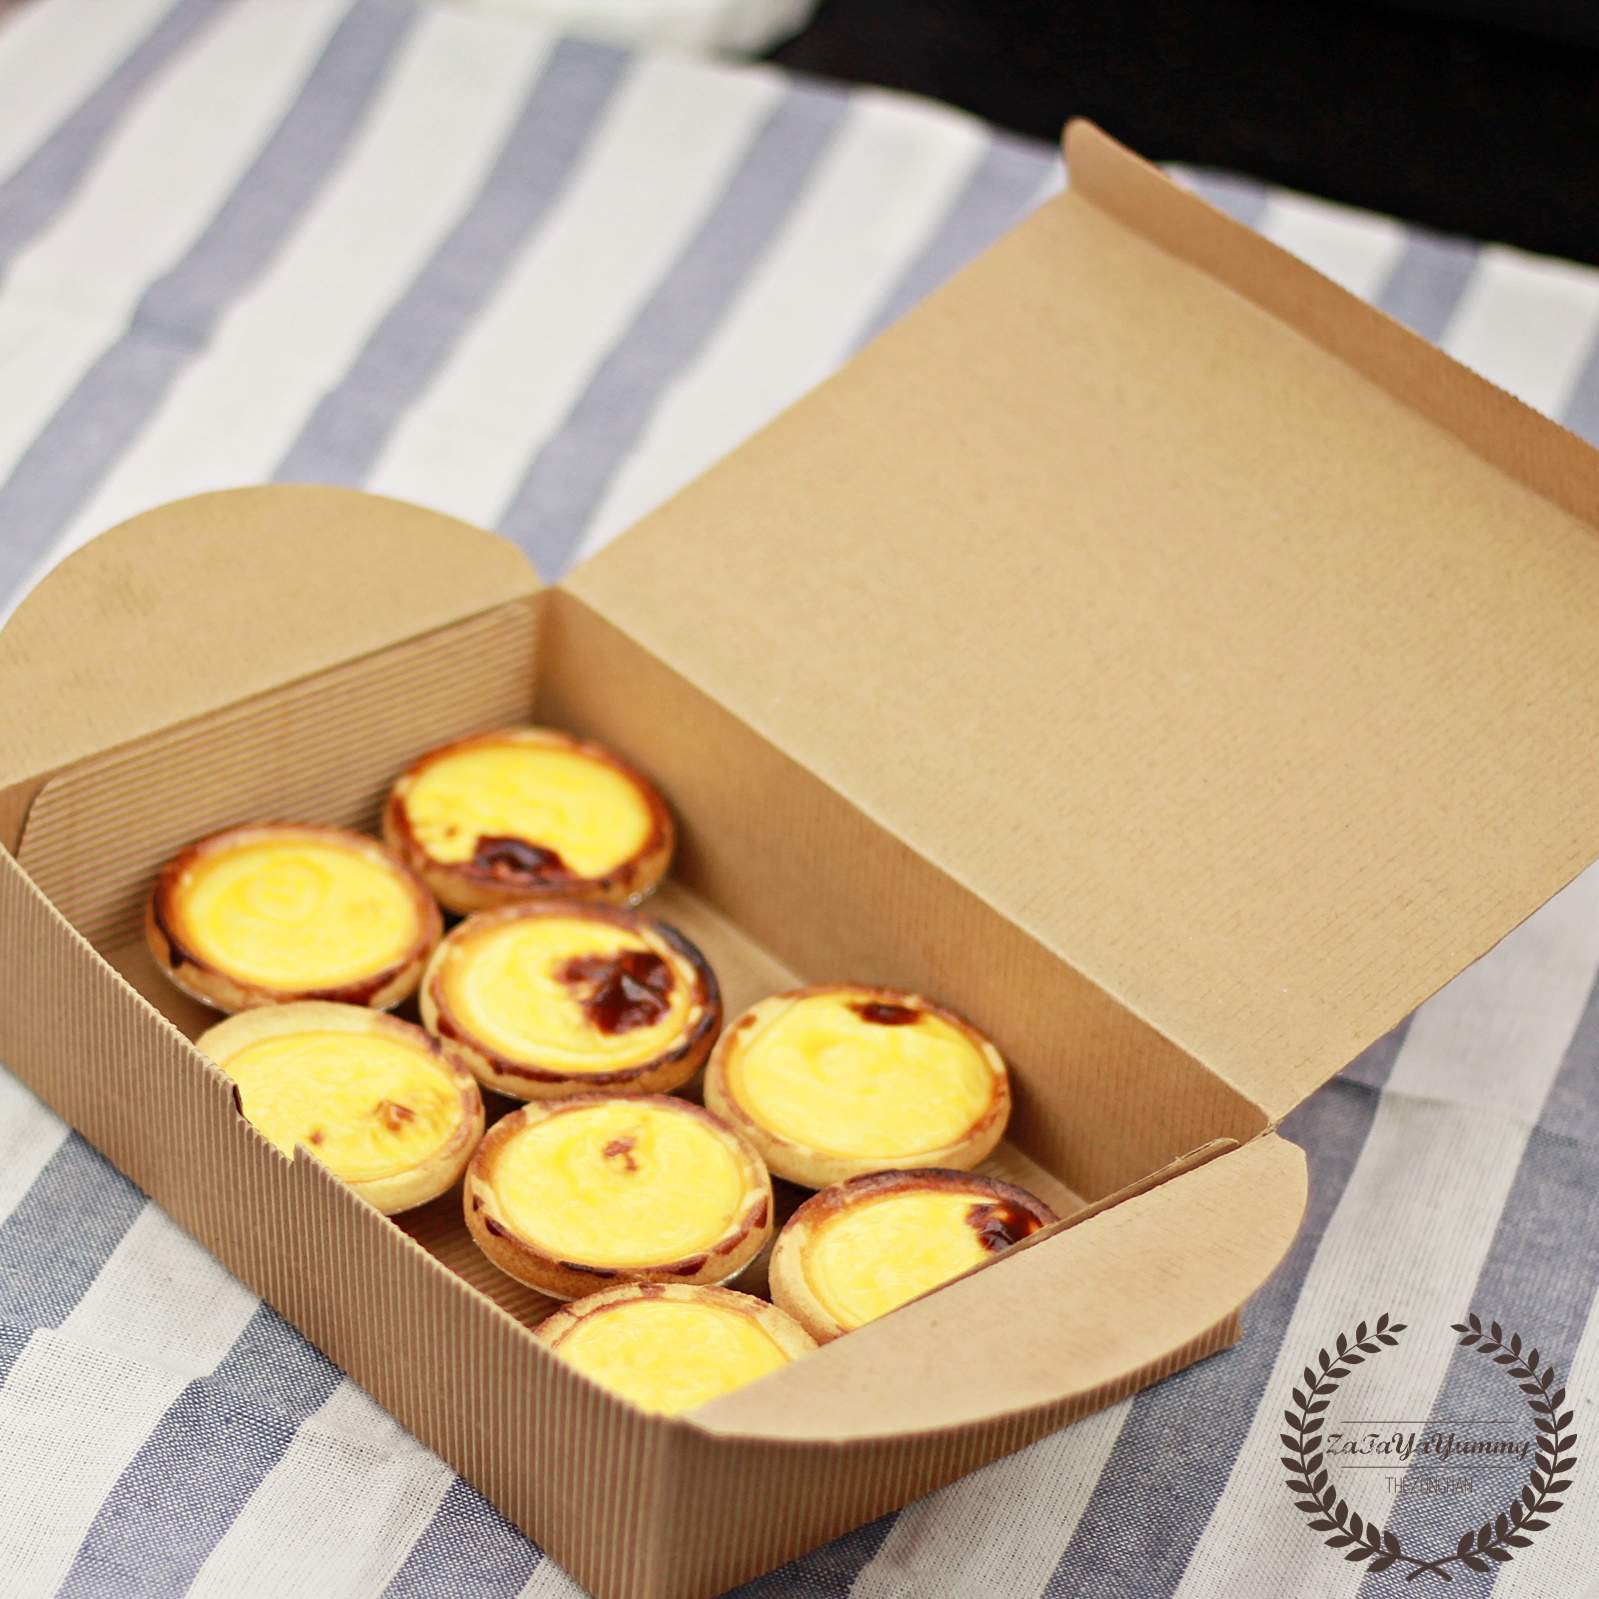 Cheese Tarts in box